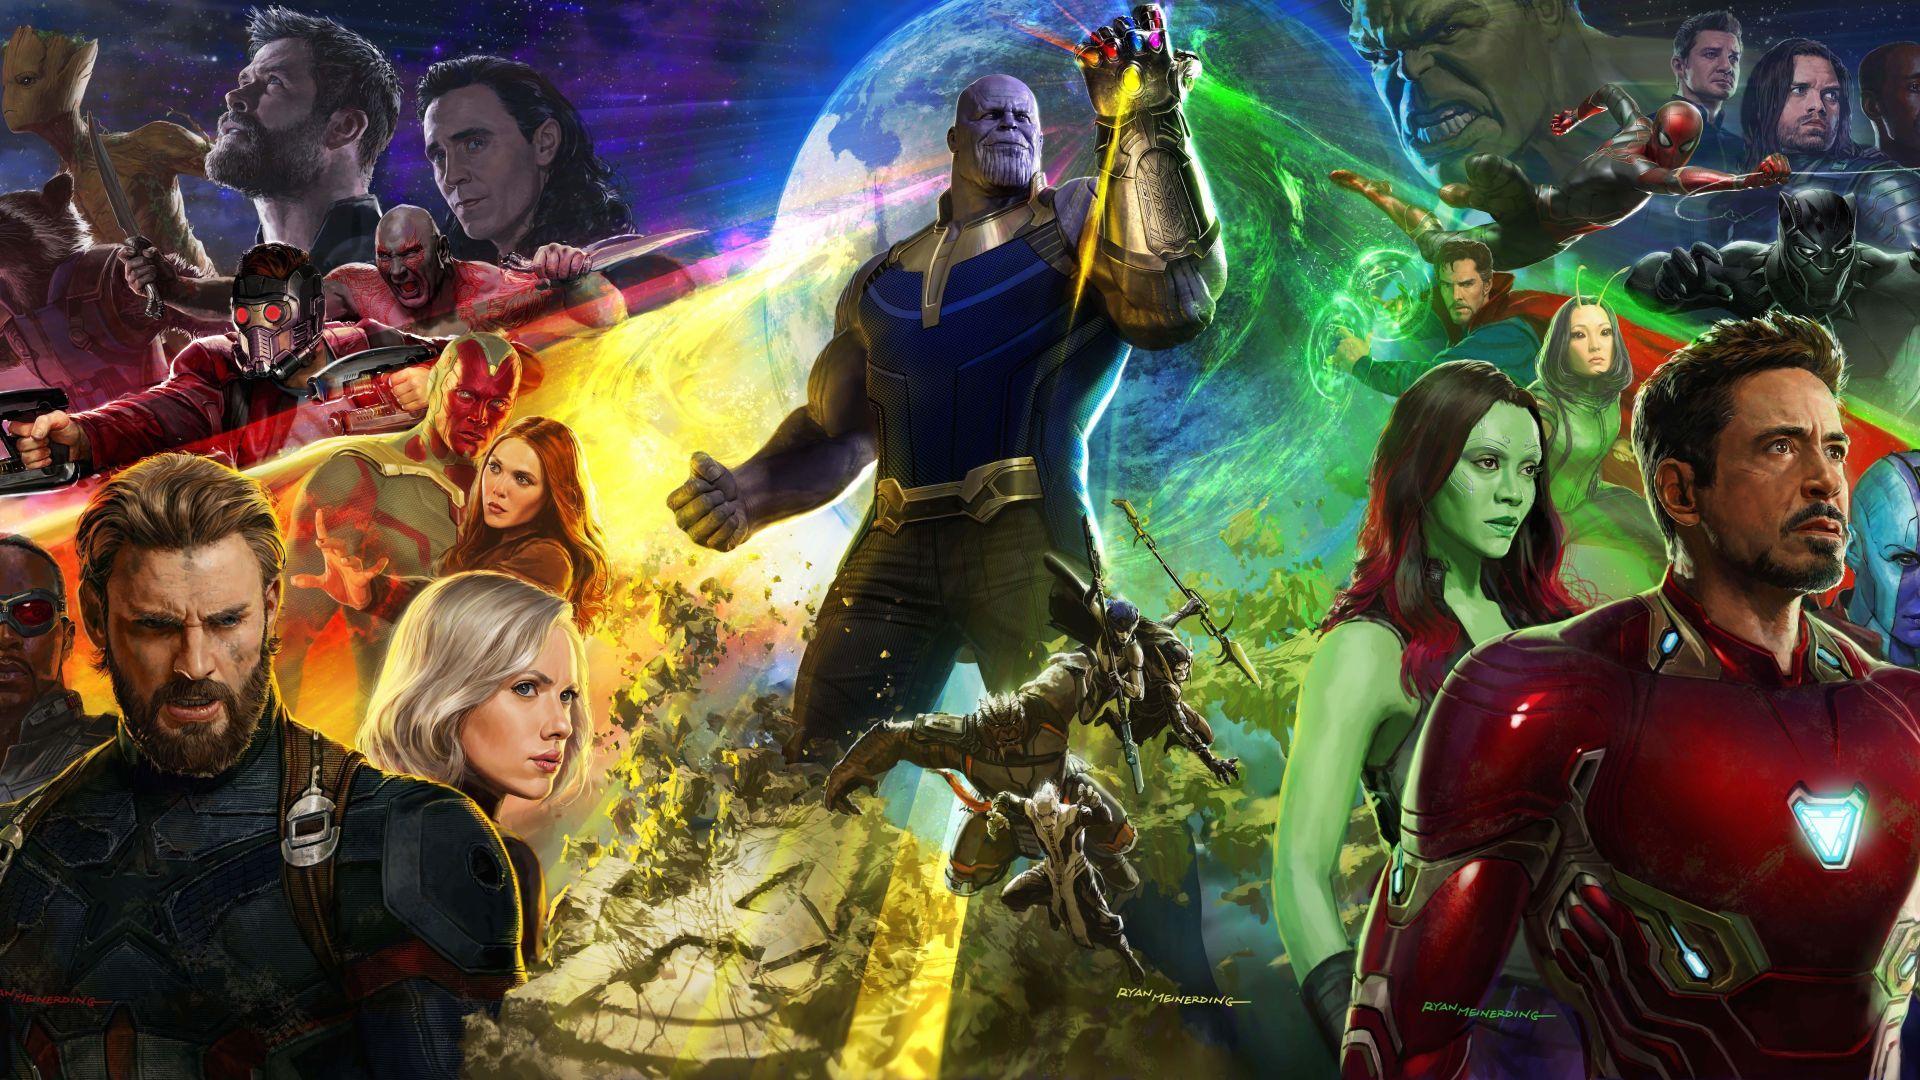 Download Wallpapers Of Avengers Infinity War Don Cheadle Robert